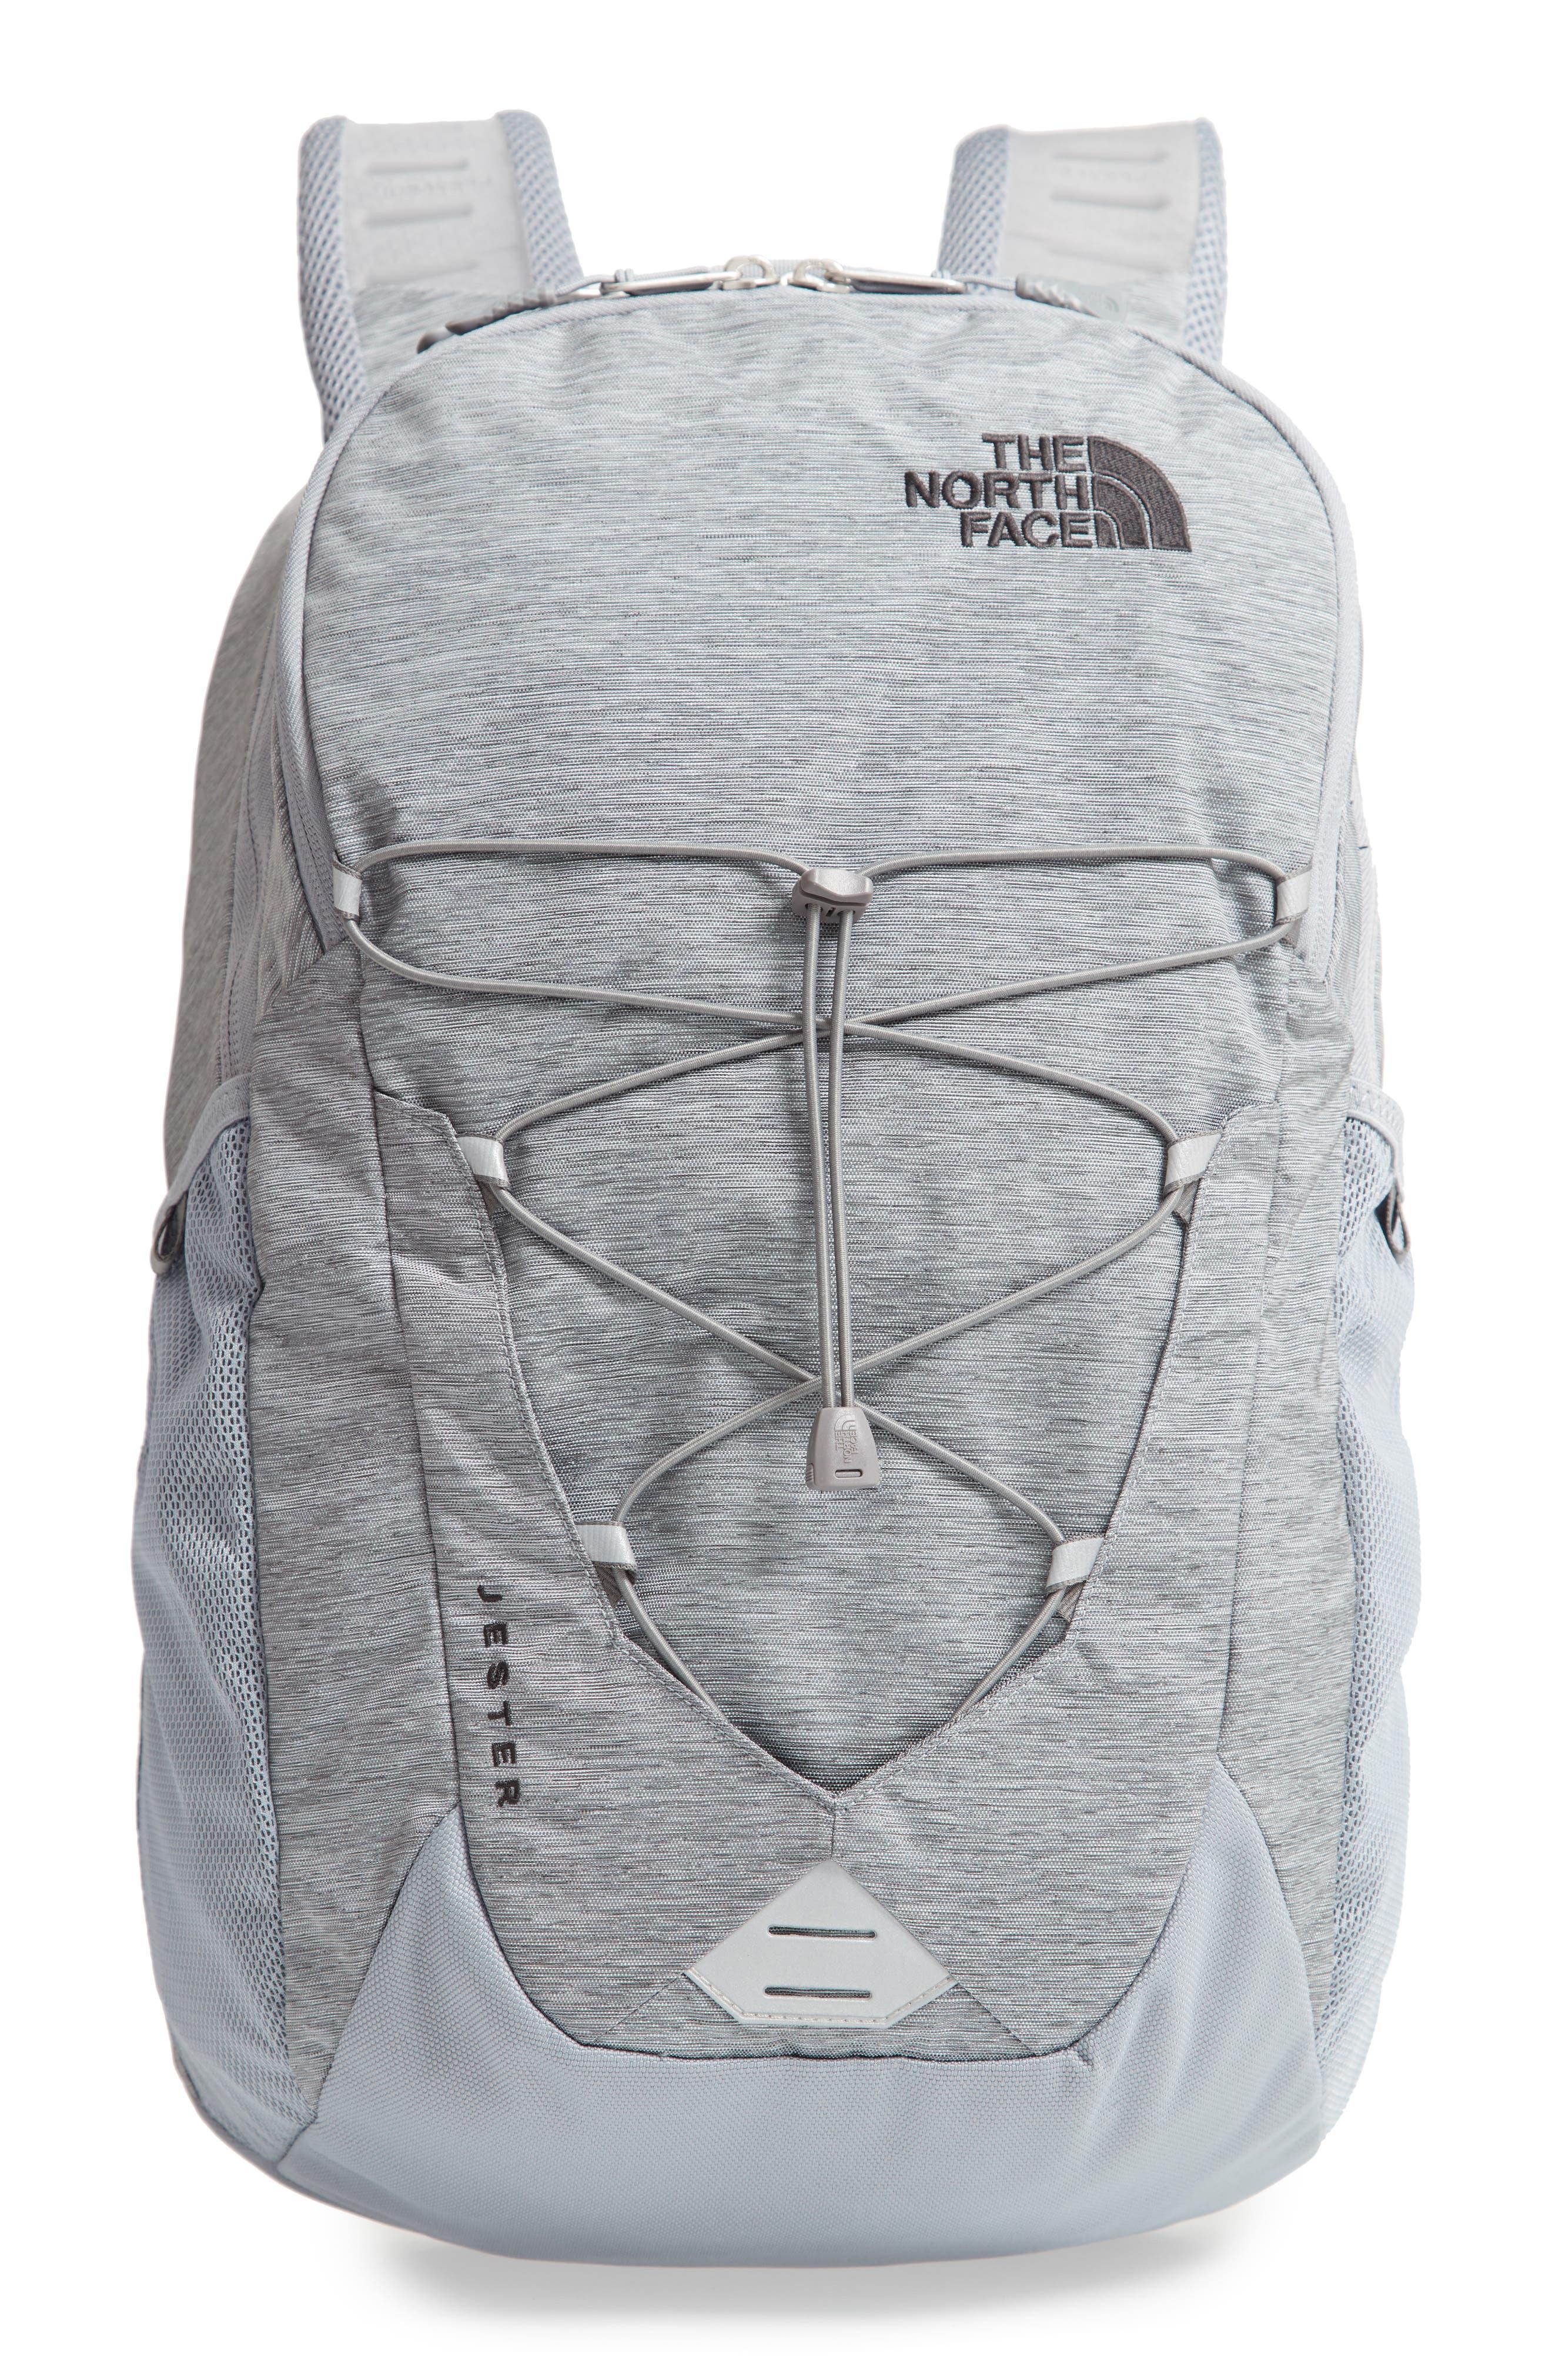 Jester Backpack,                             Main thumbnail 1, color,                             GREY DARK HEATHER/ TNF BLACK